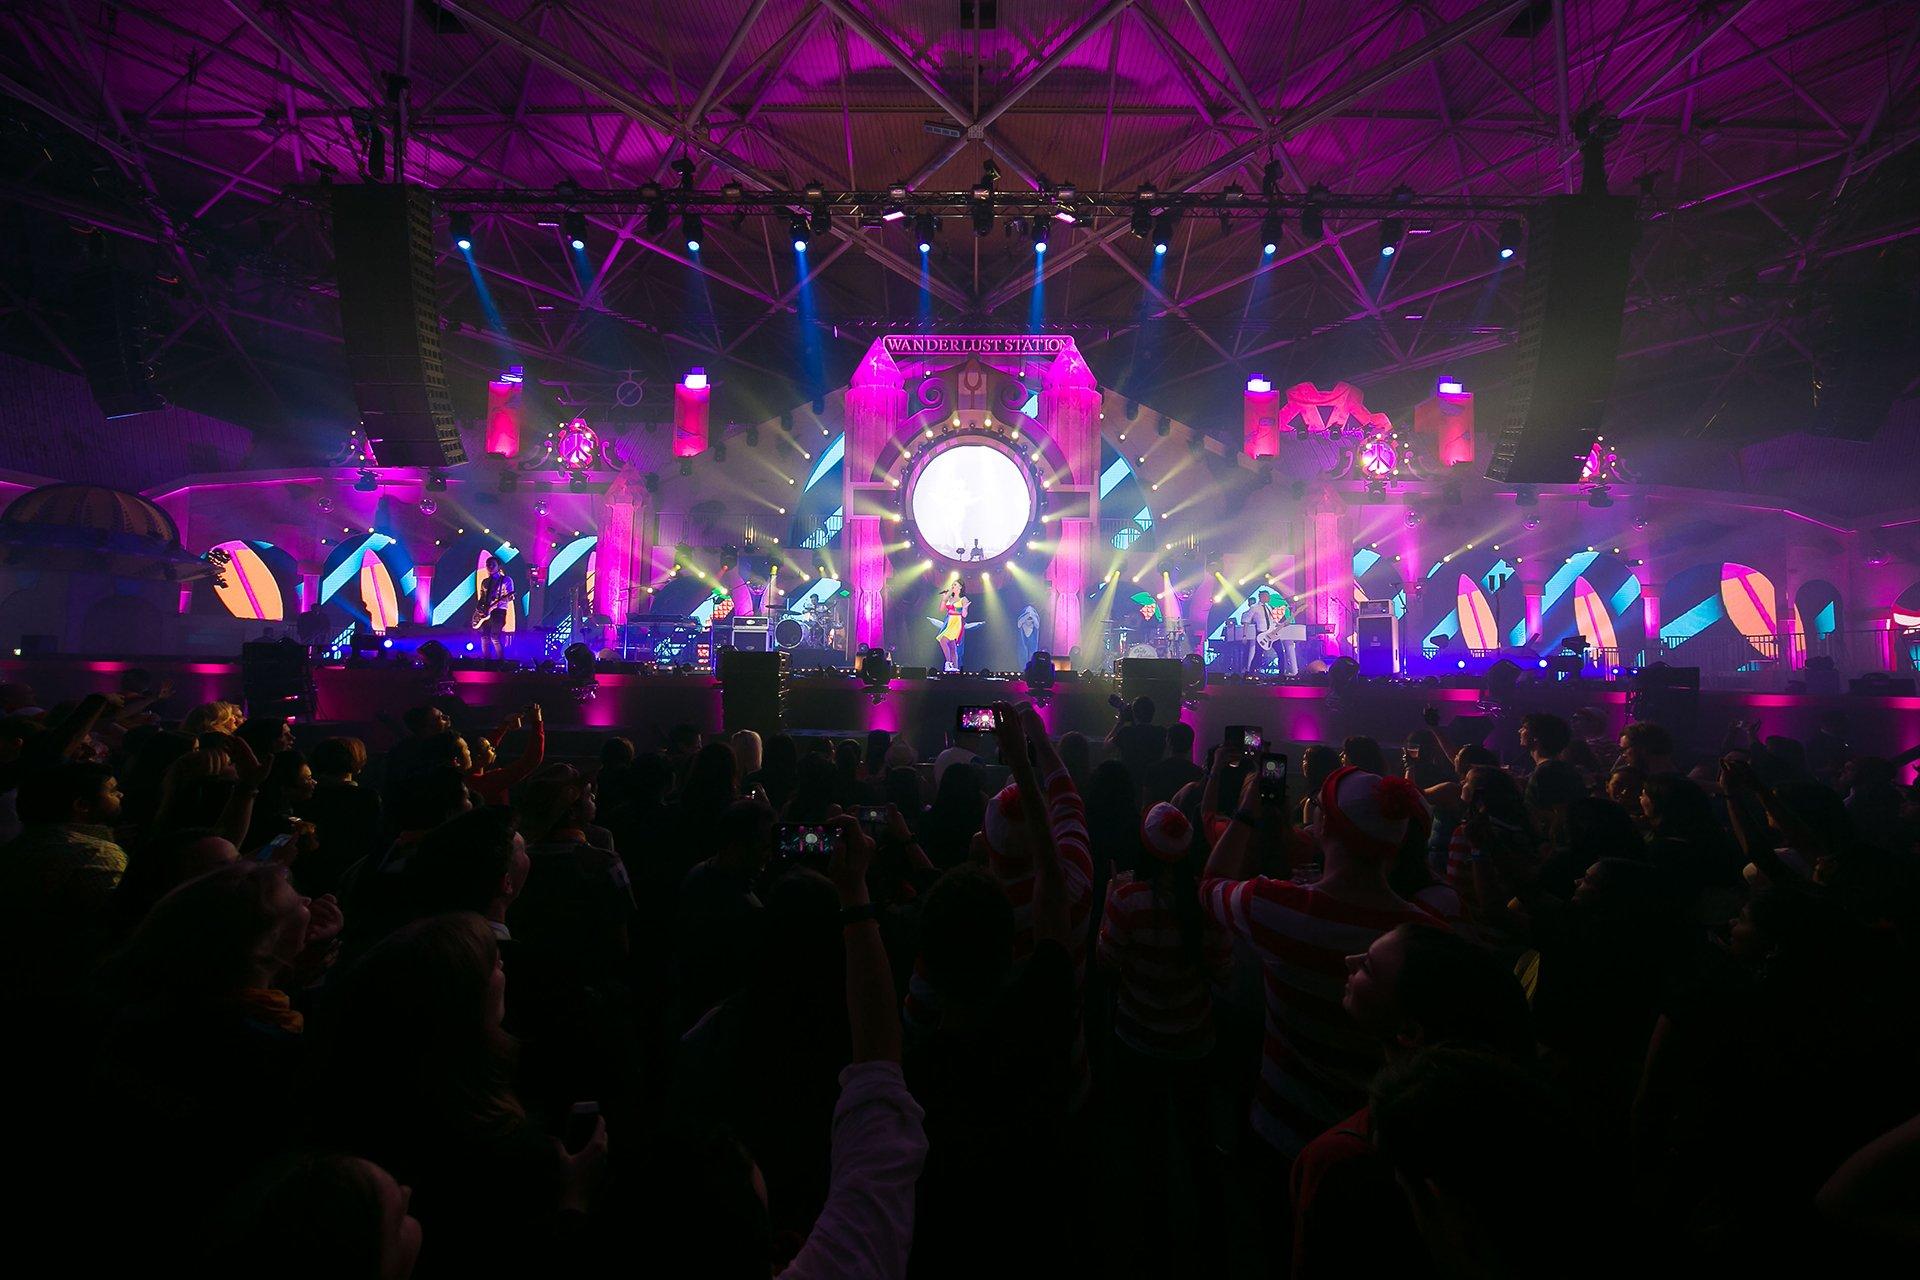 Corporate Event RAI Amsterdam 2016